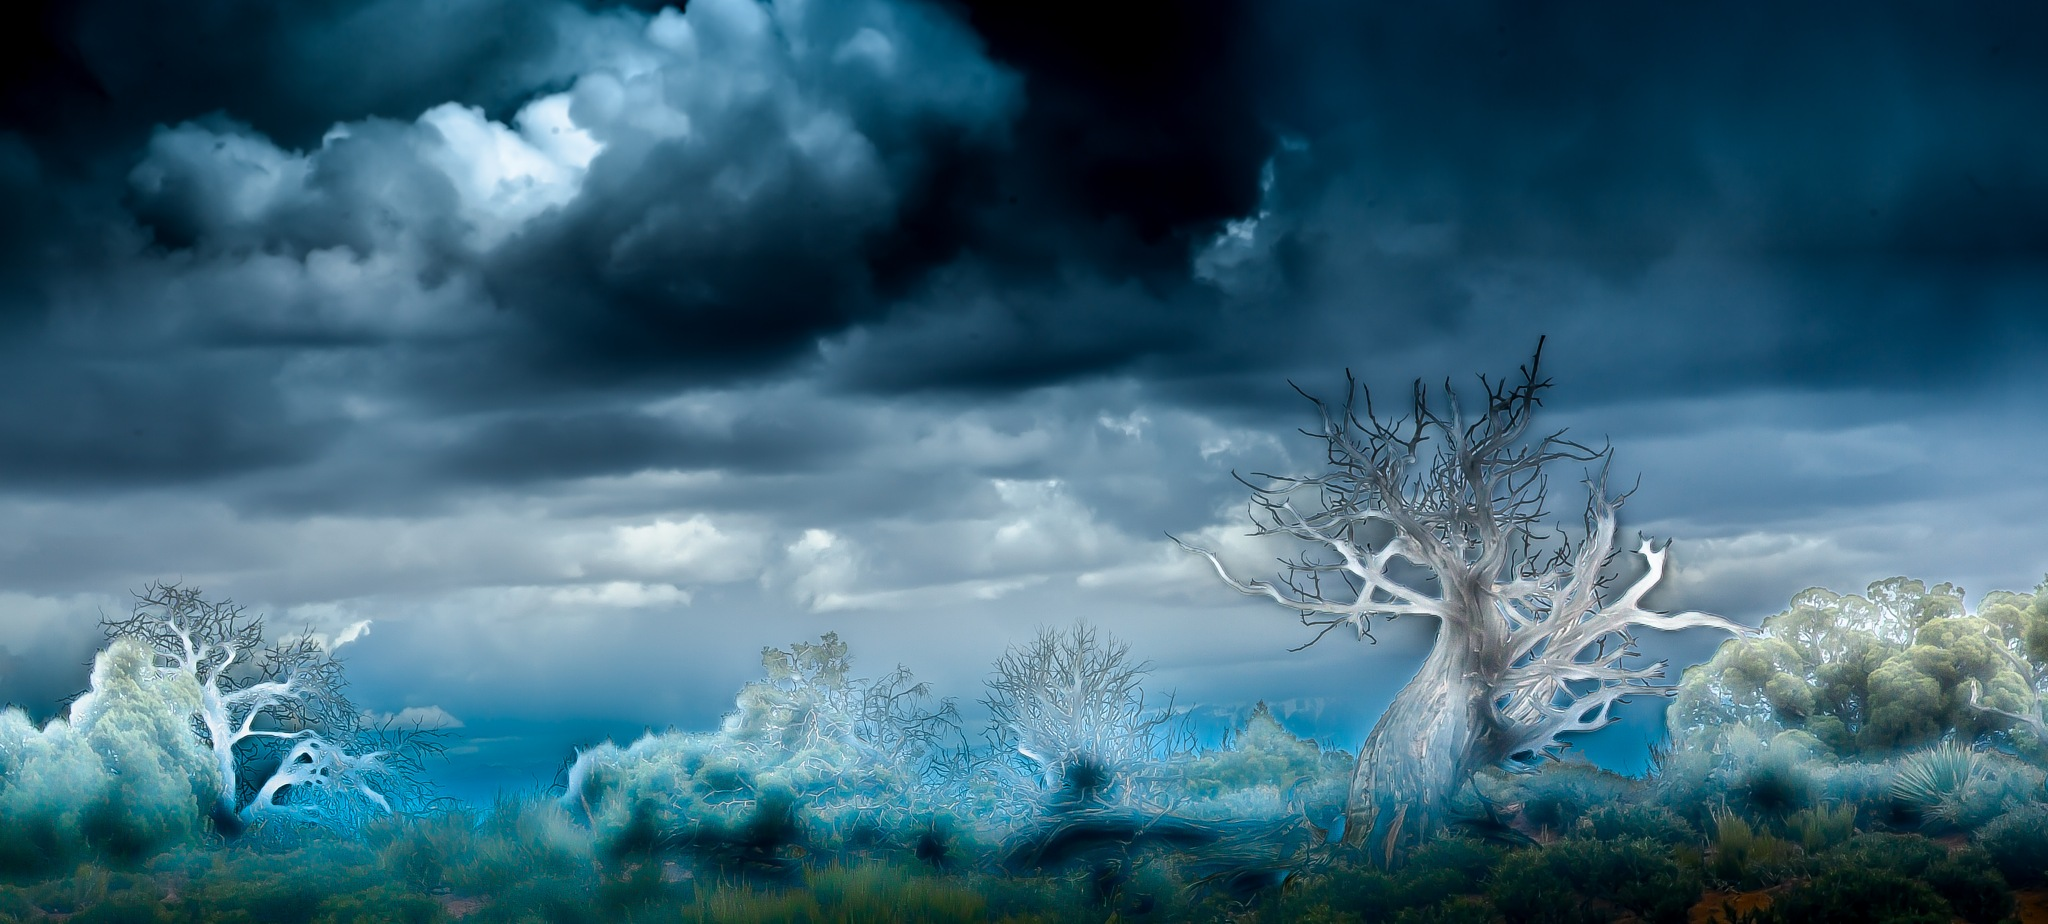 ghostscape by volkhard sturzbecher